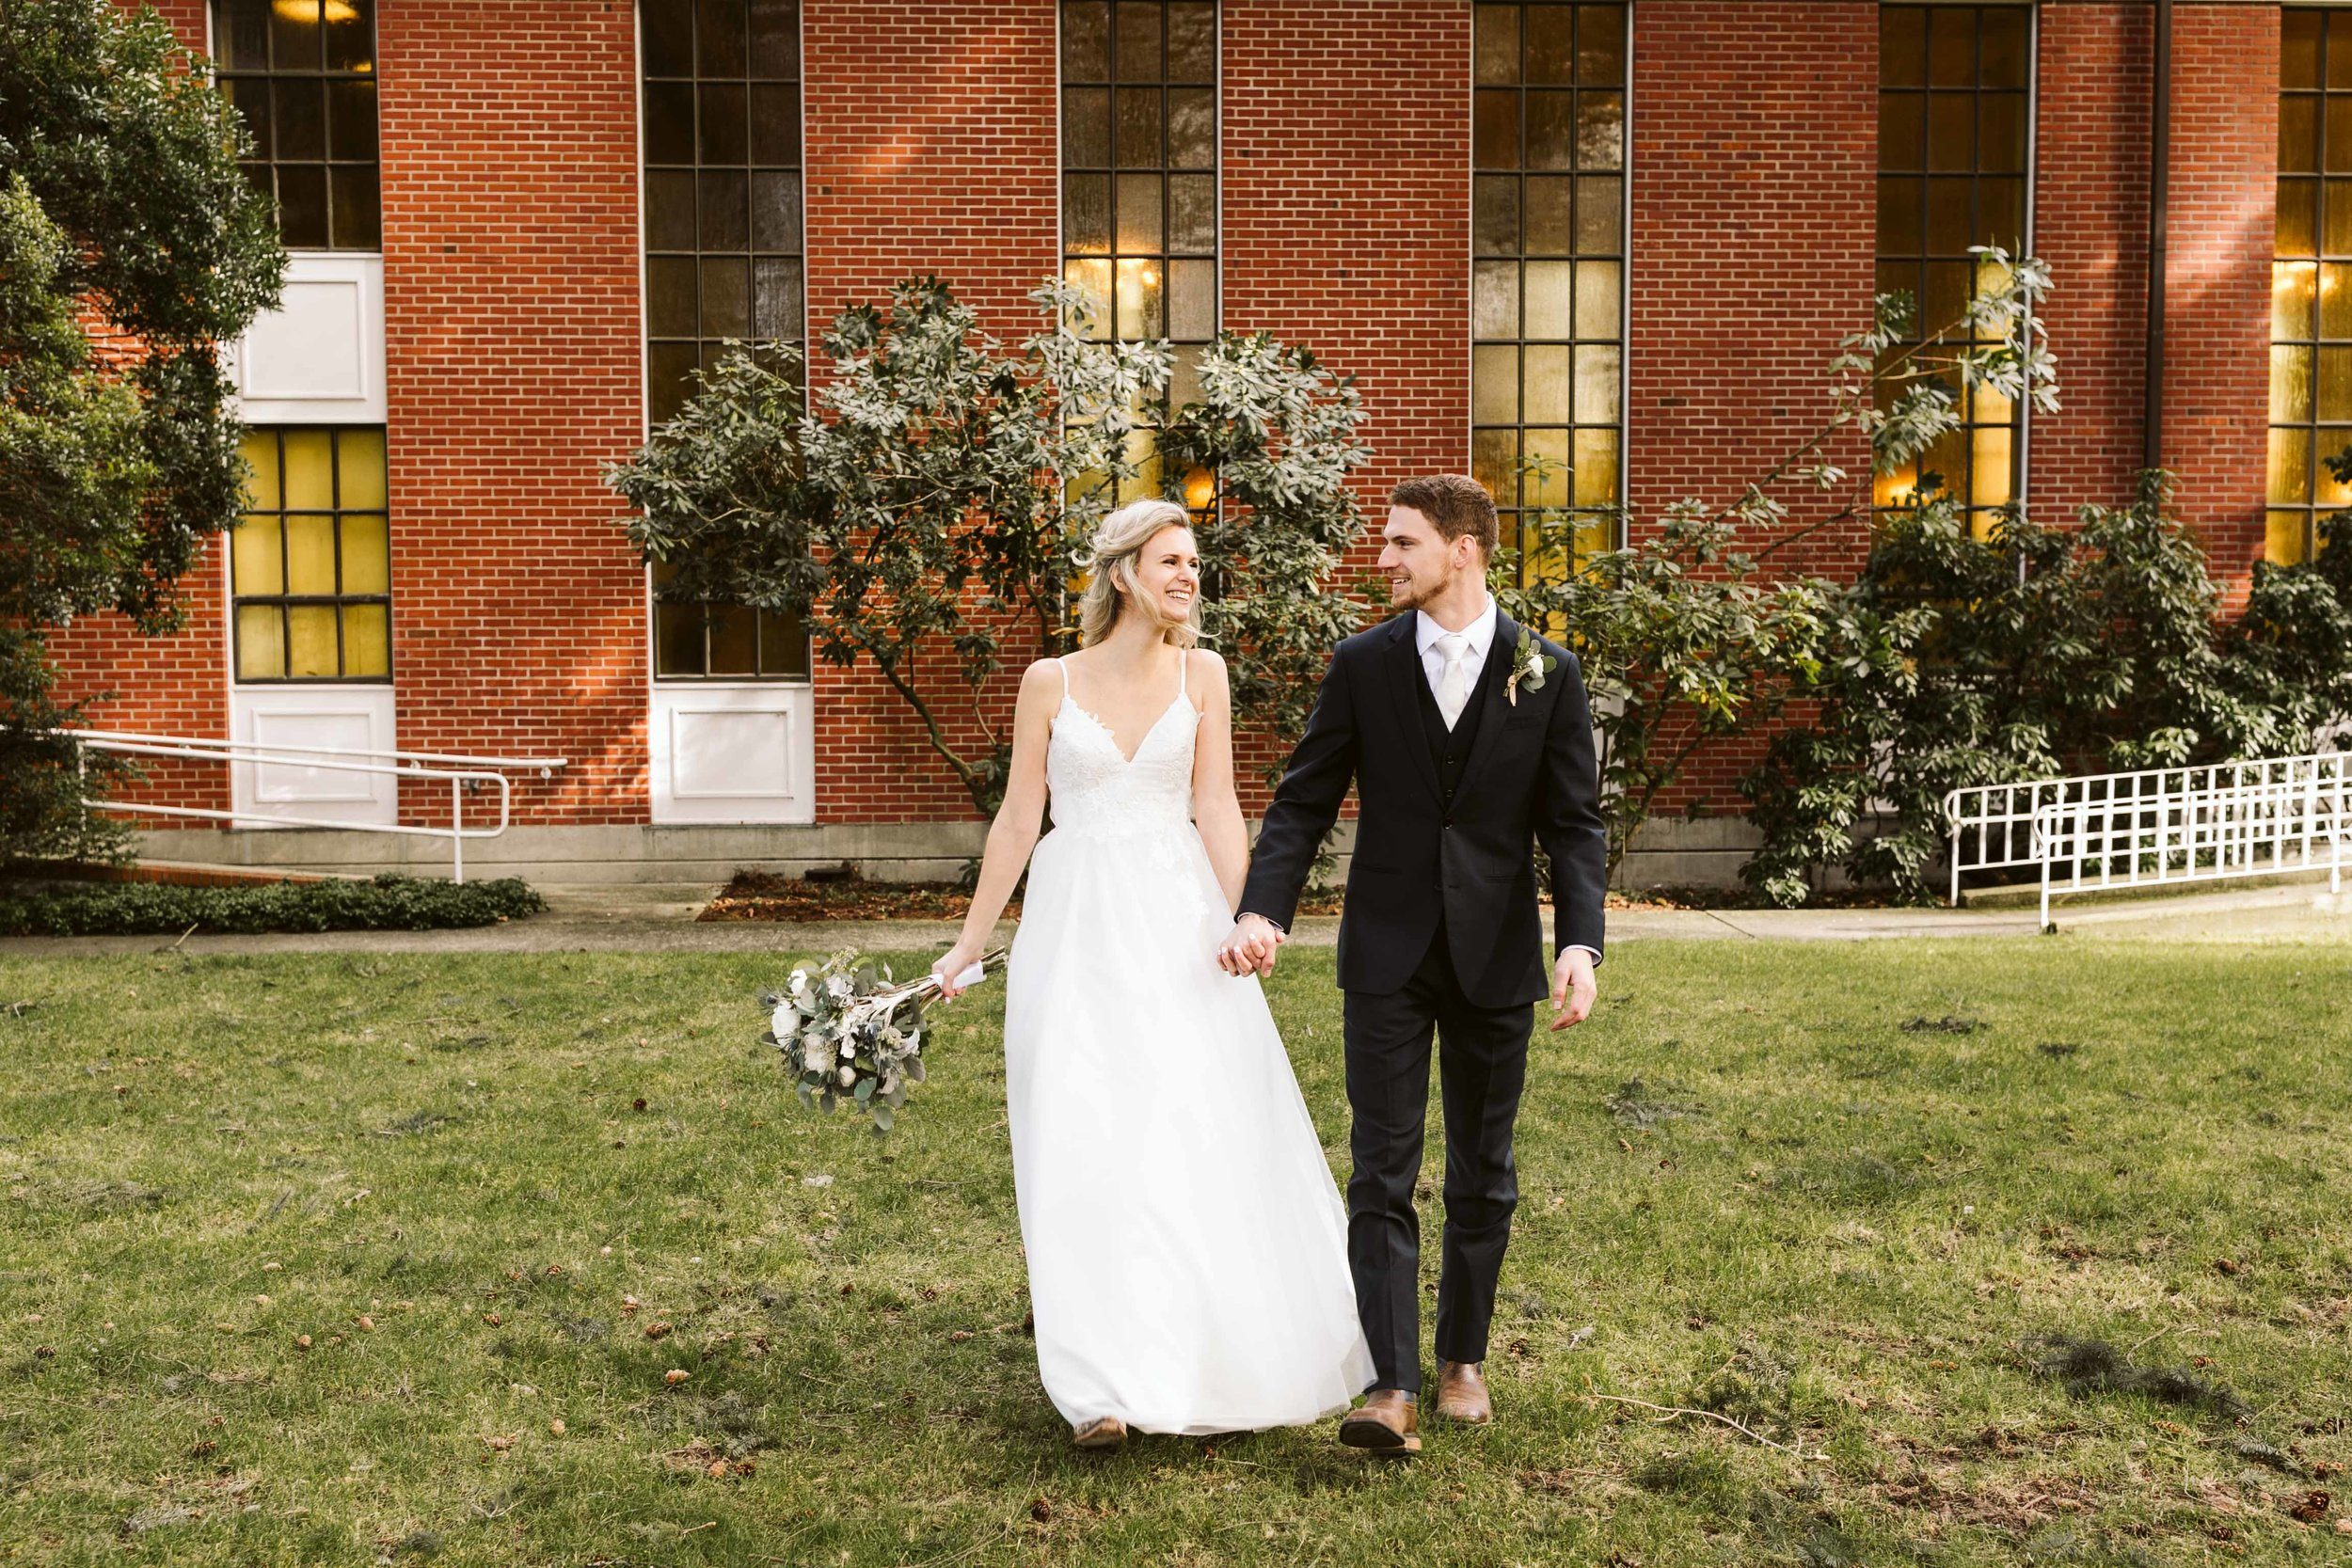 kilworth-memorial-chapel-wedding-36.jpg